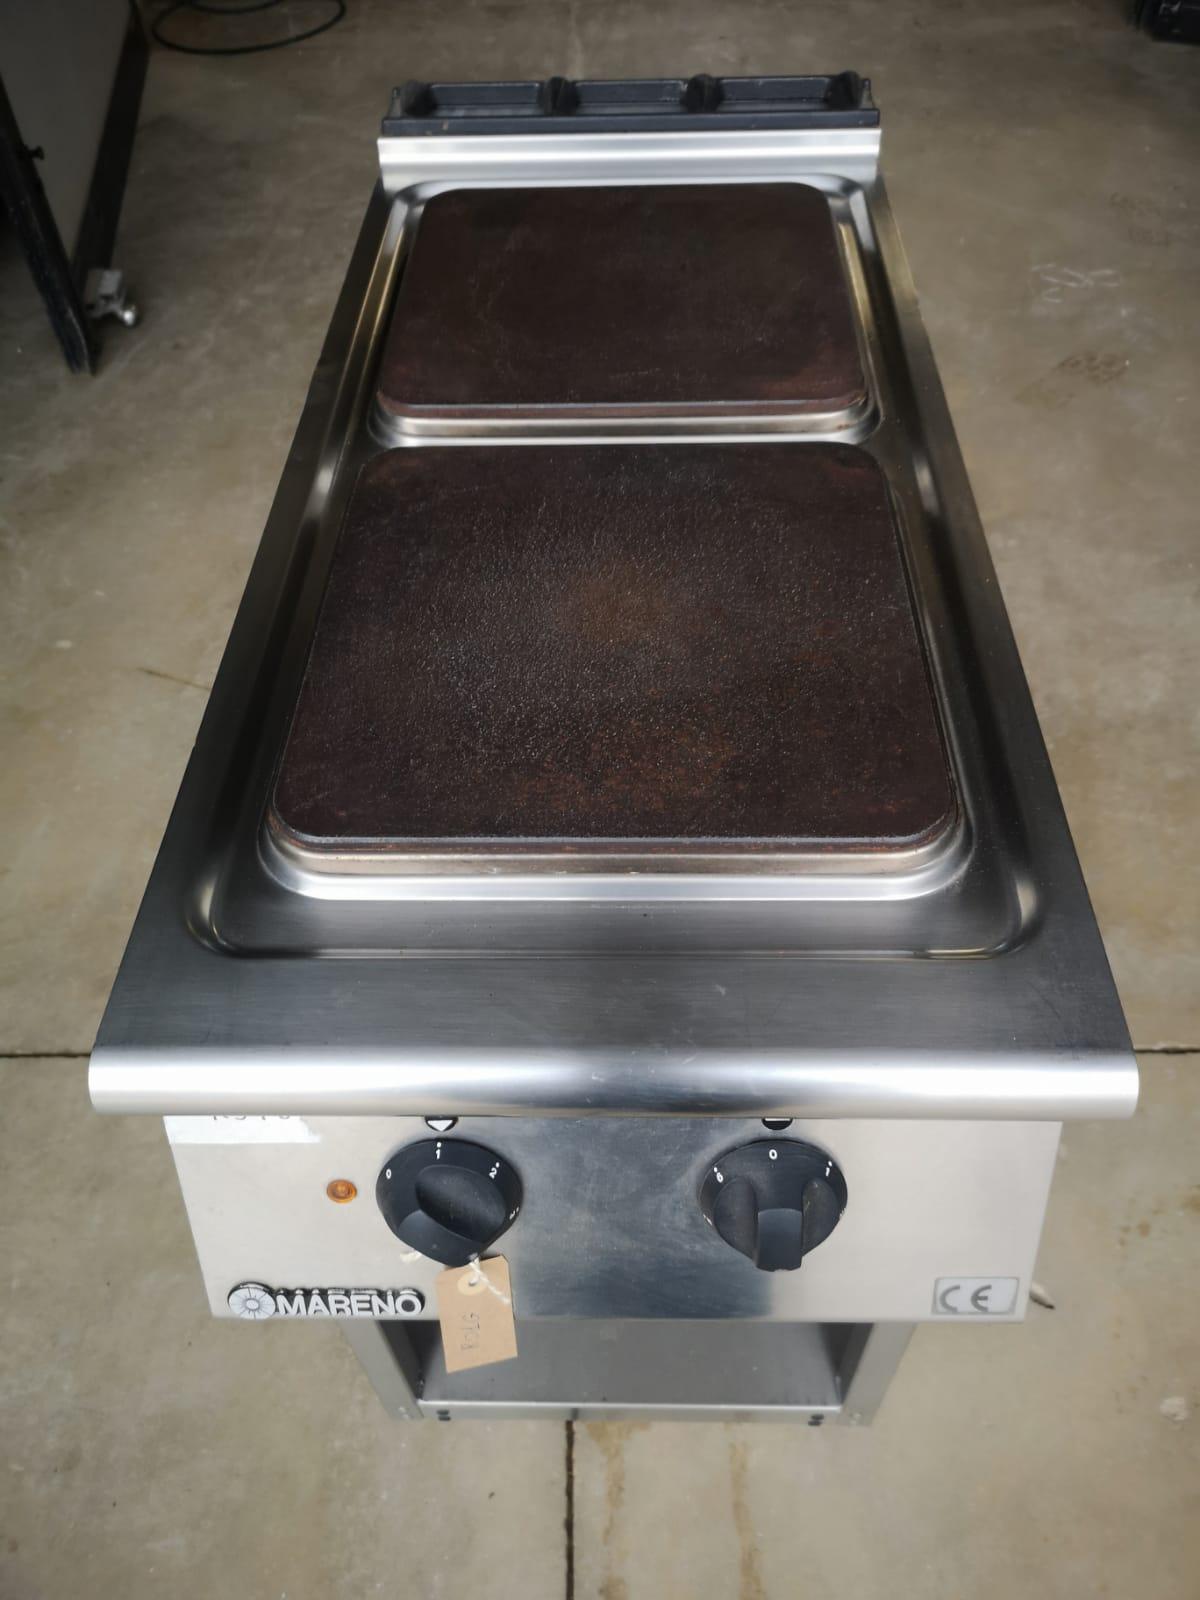 Cucina elettrica 2 piastre Mareno